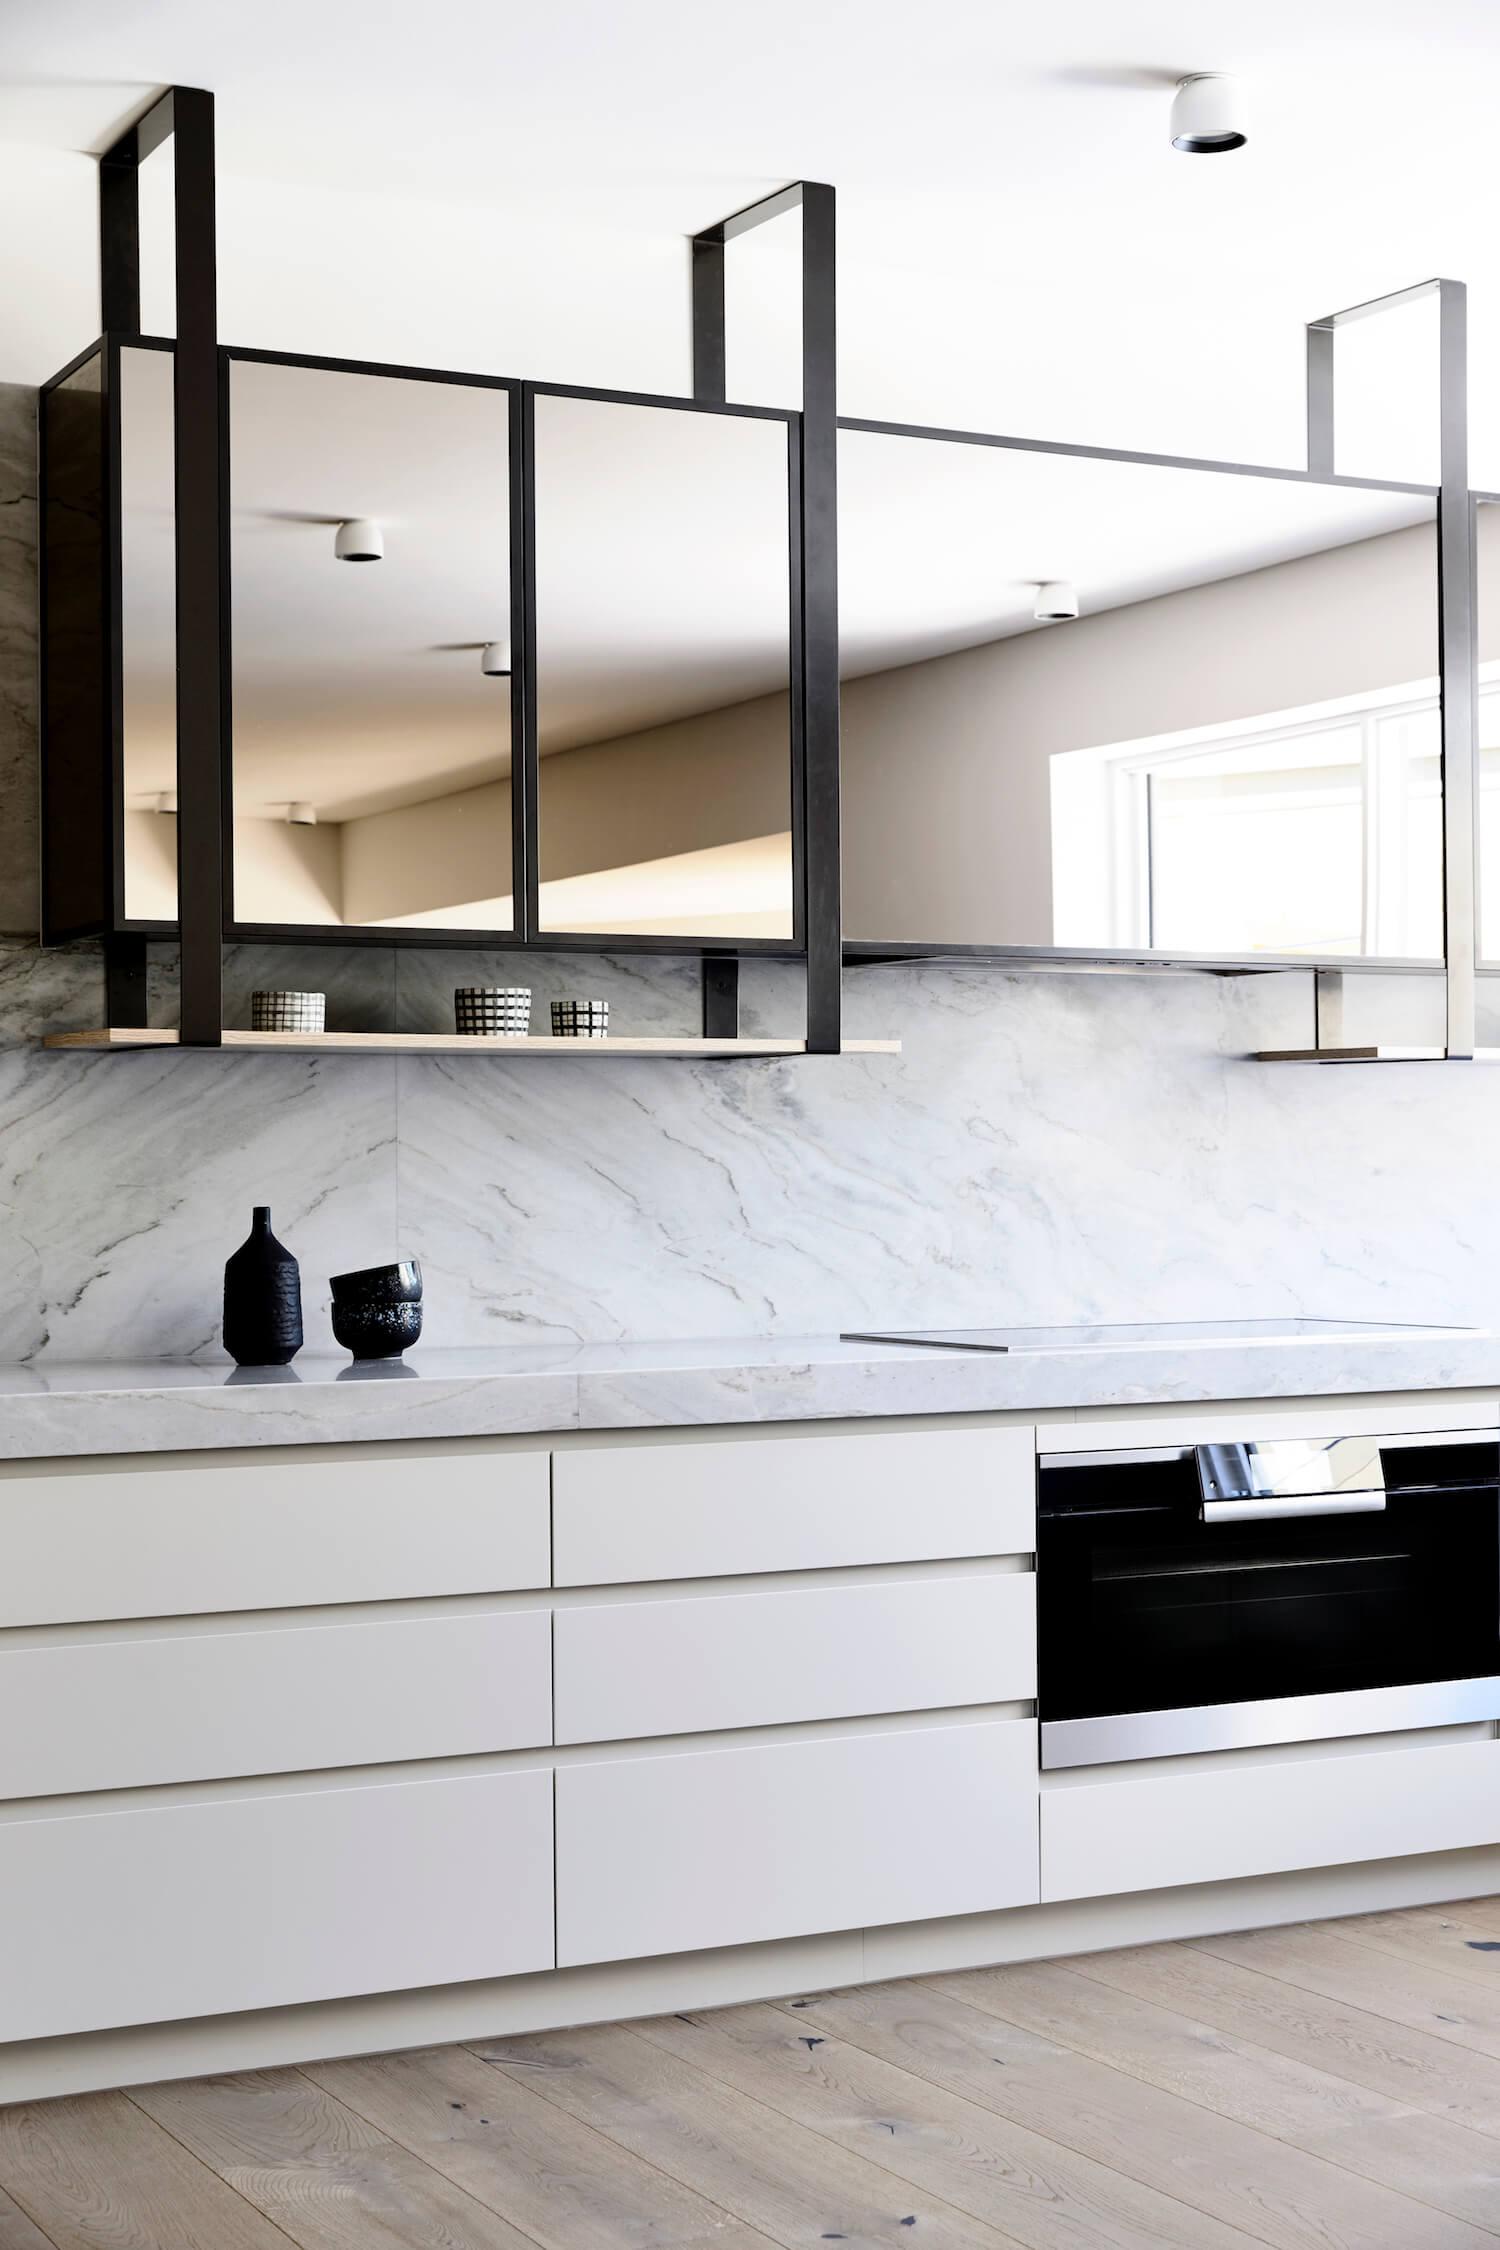 est living australian interiors doherty design ivanhoe 11